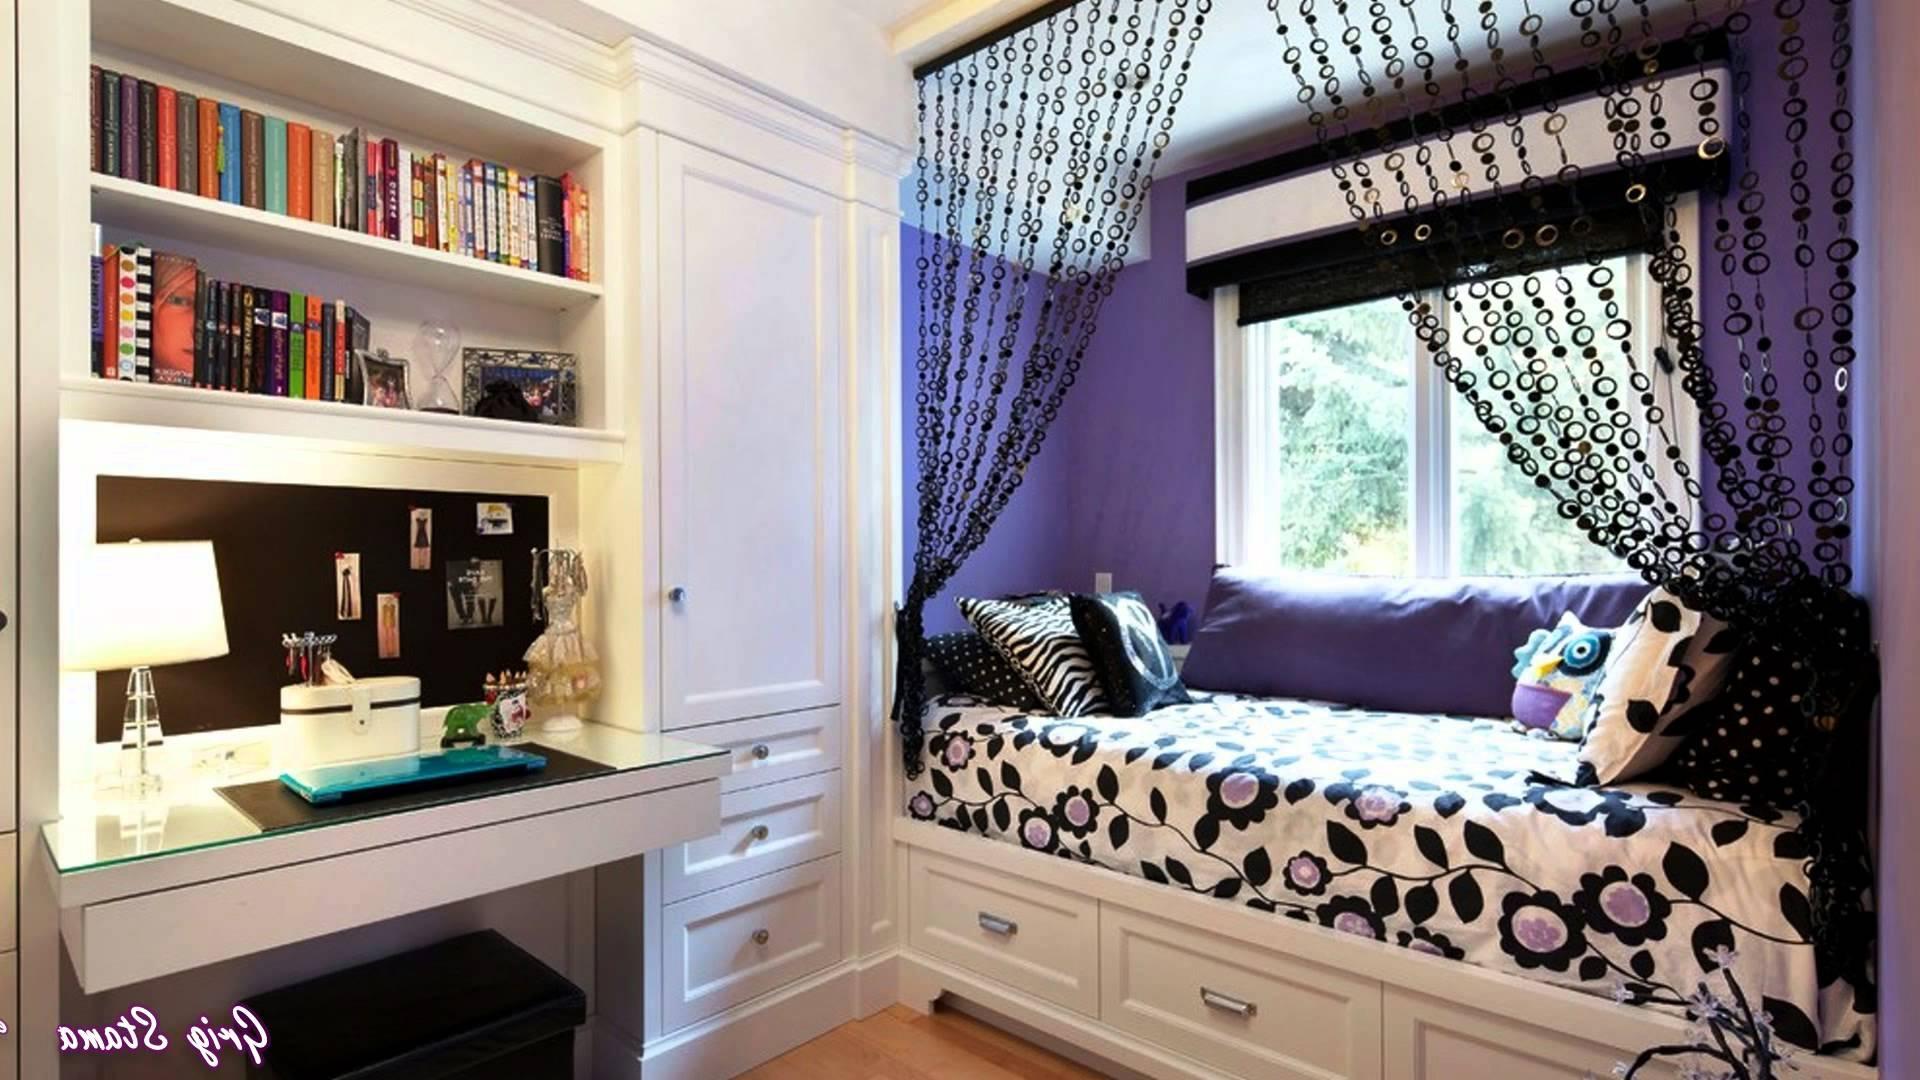 diy room decorating ideas for teenage girls youtube diy teenage with diy room decorating ideas for bedroom photo teenage bedroom ideas